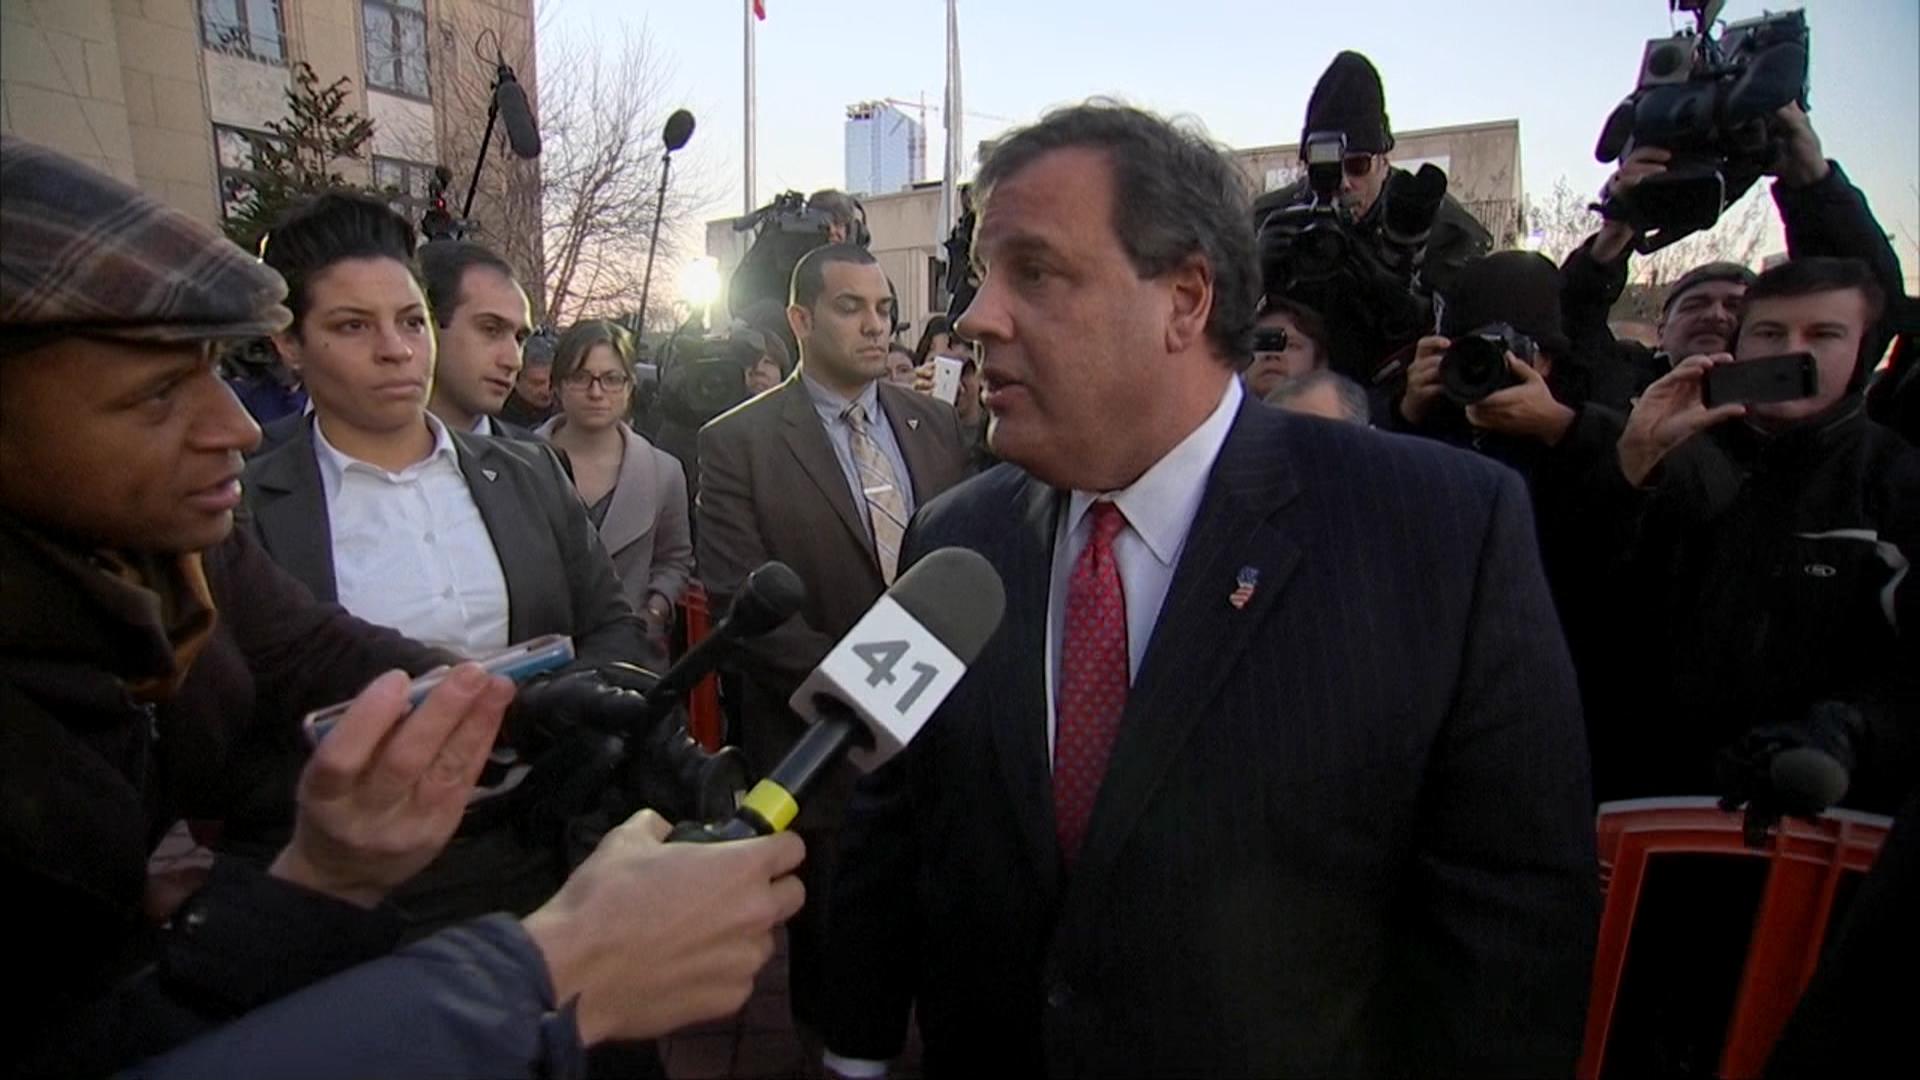 Christie investigation grows